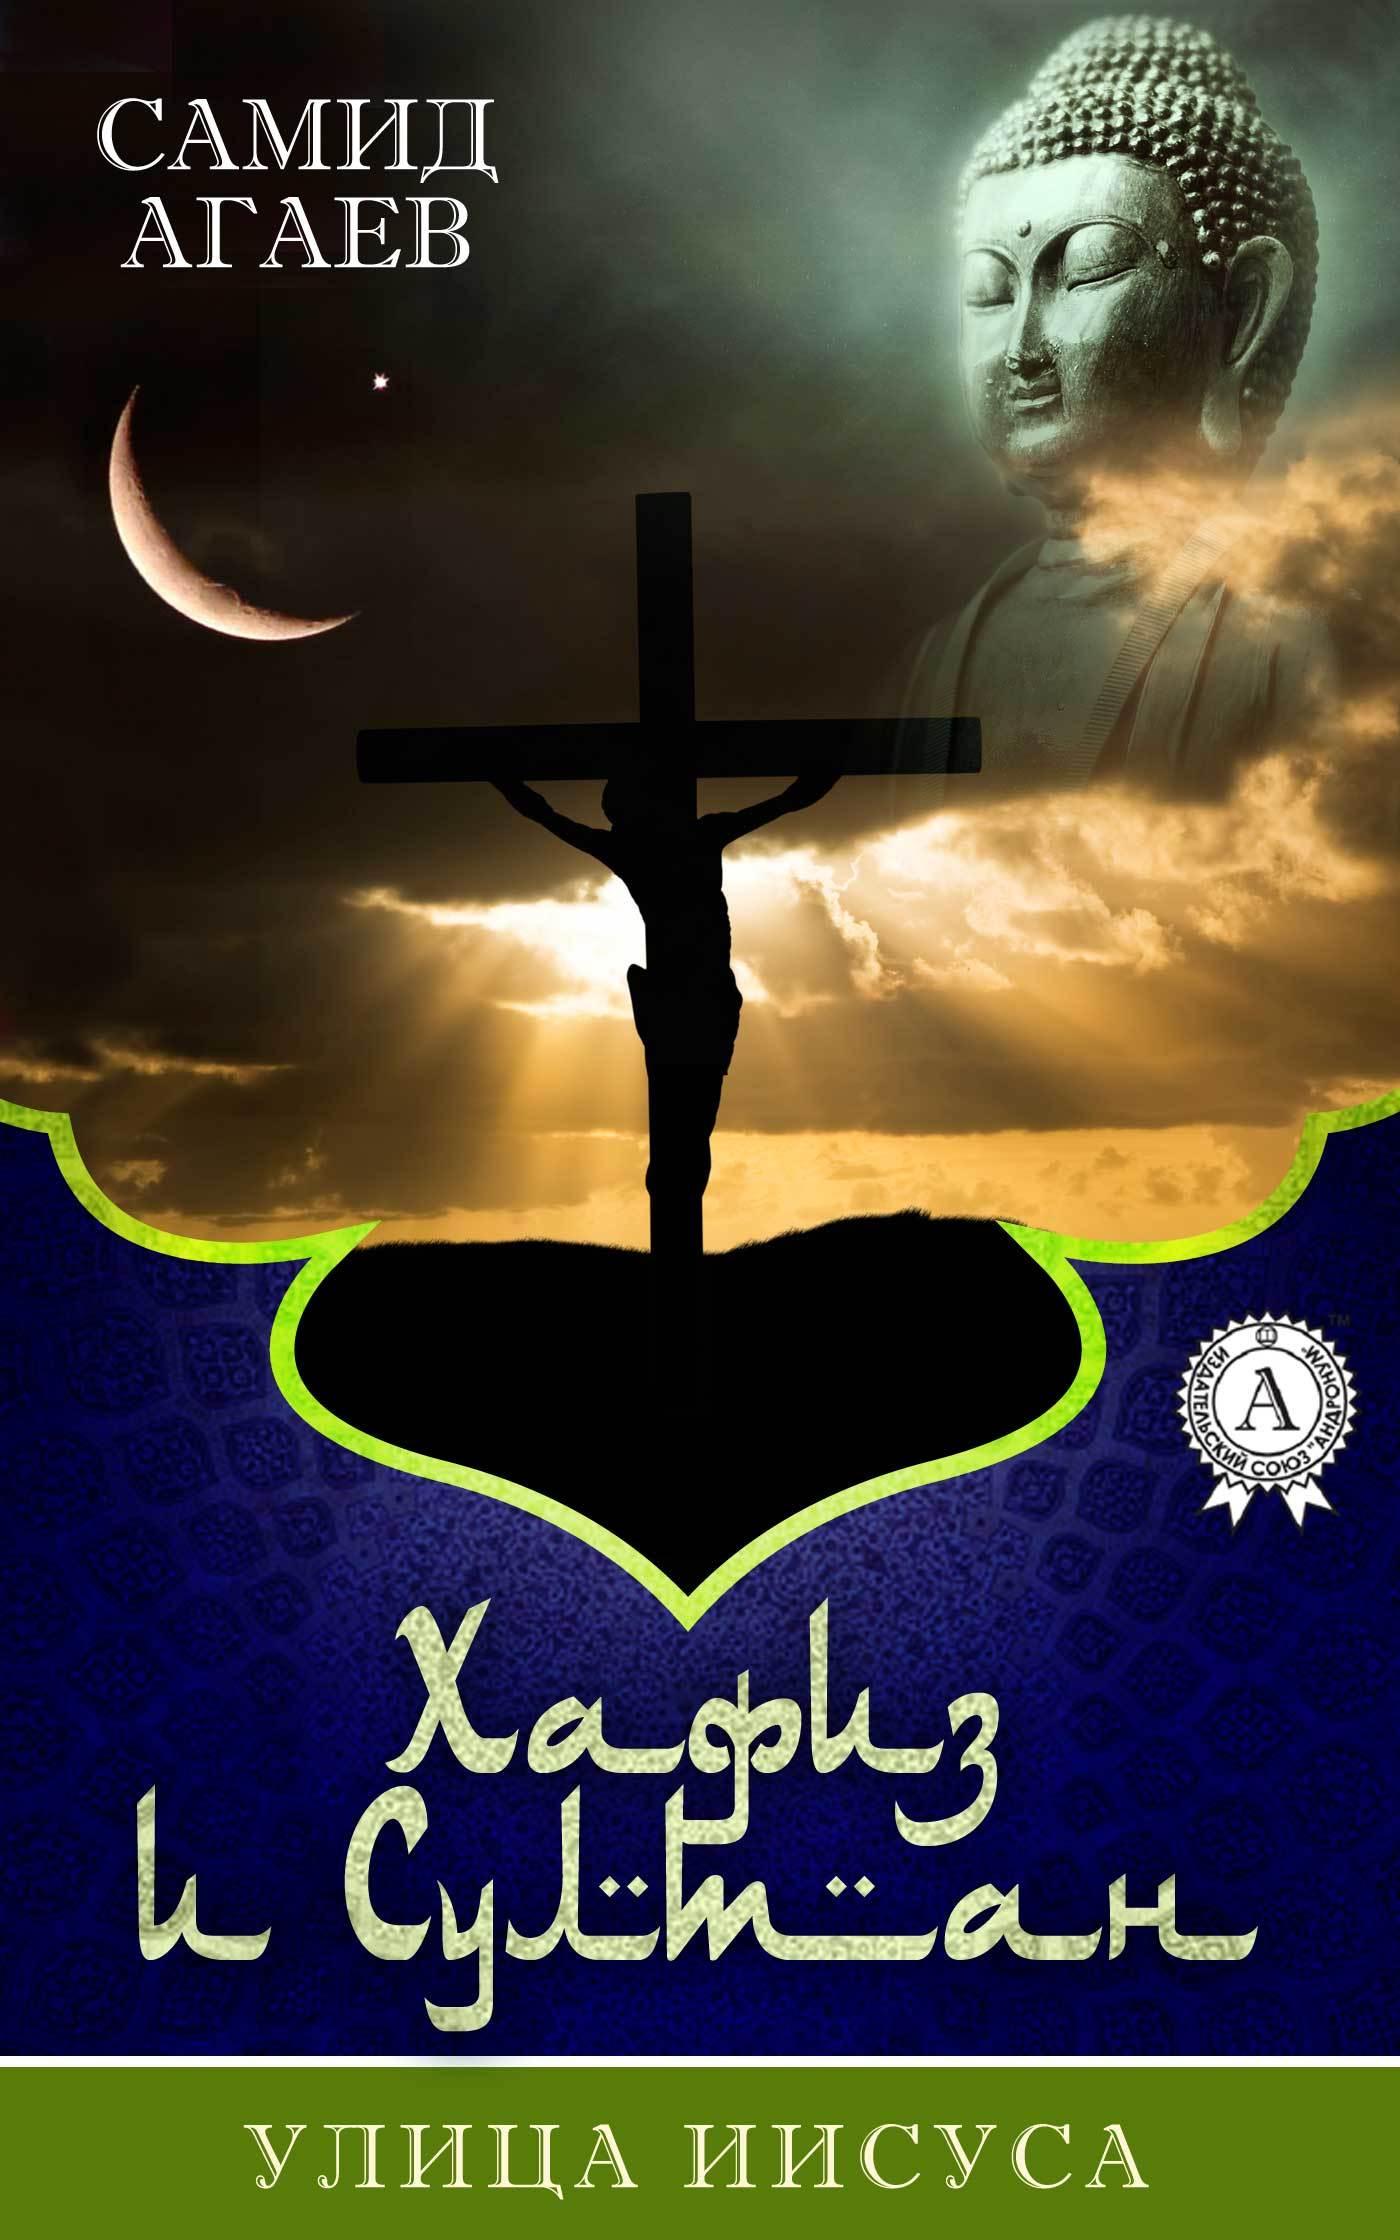 Самид Агаев Улица Иисуса хафиз газели часть 1